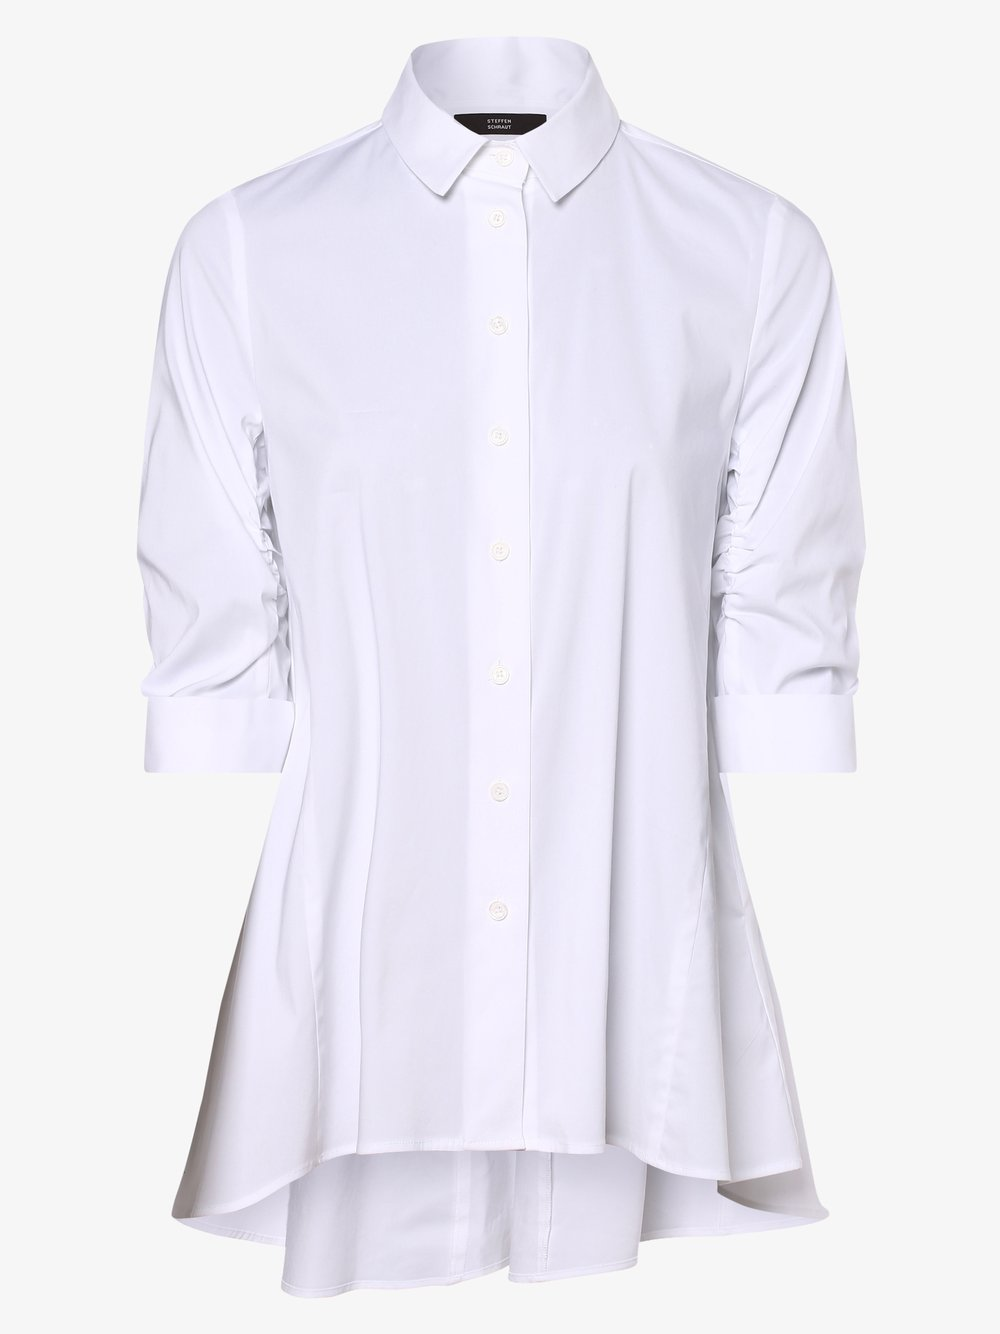 STEFFEN SCHRAUT – Bluzka damska, biały Van Graaf 462222-0001